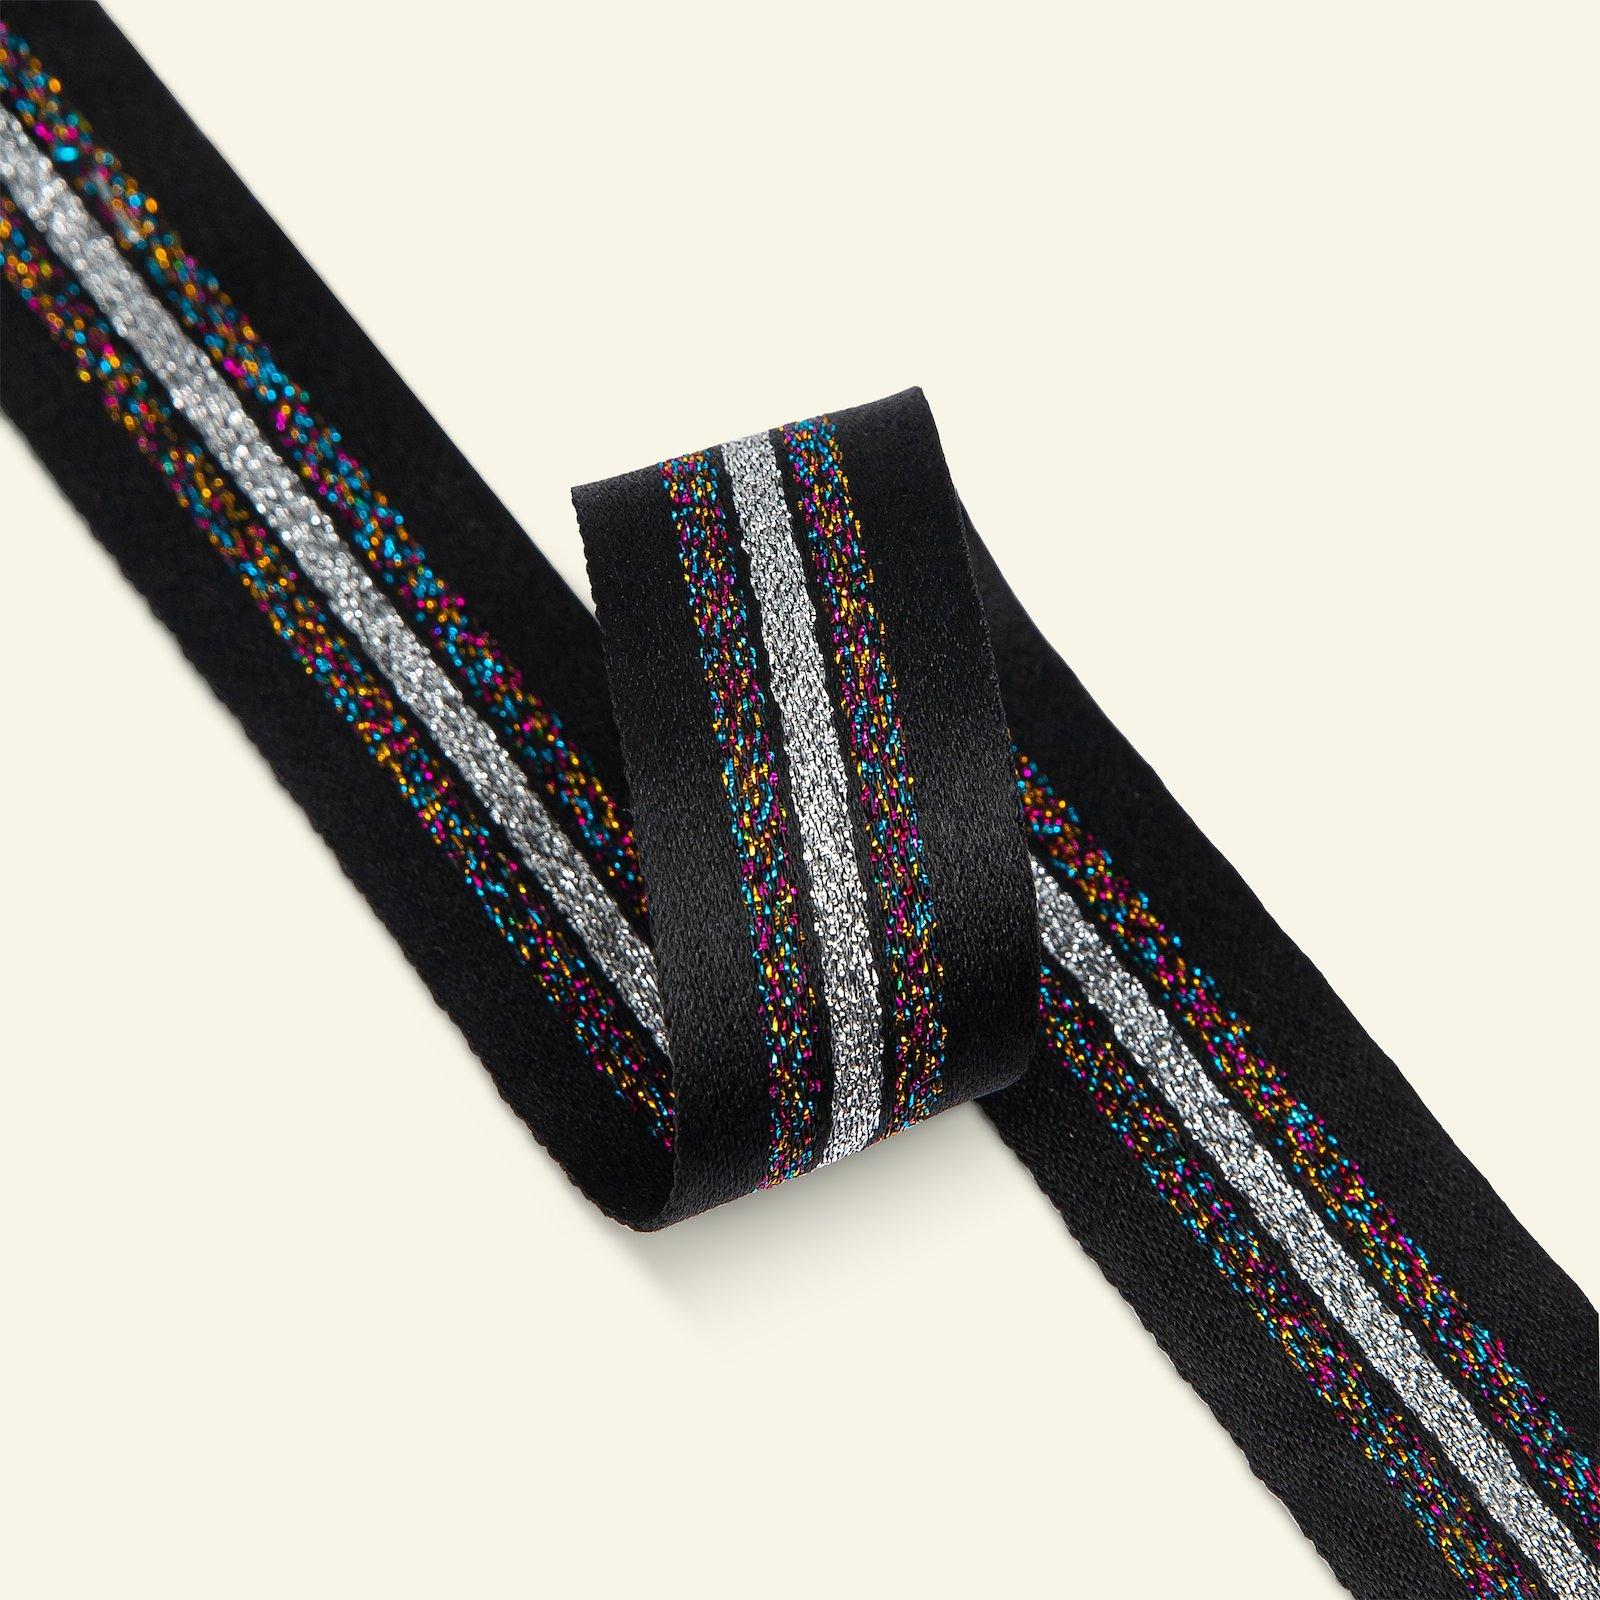 Ribbon woven 25mm bla/mul/sølv lurex 3m 21374_pack